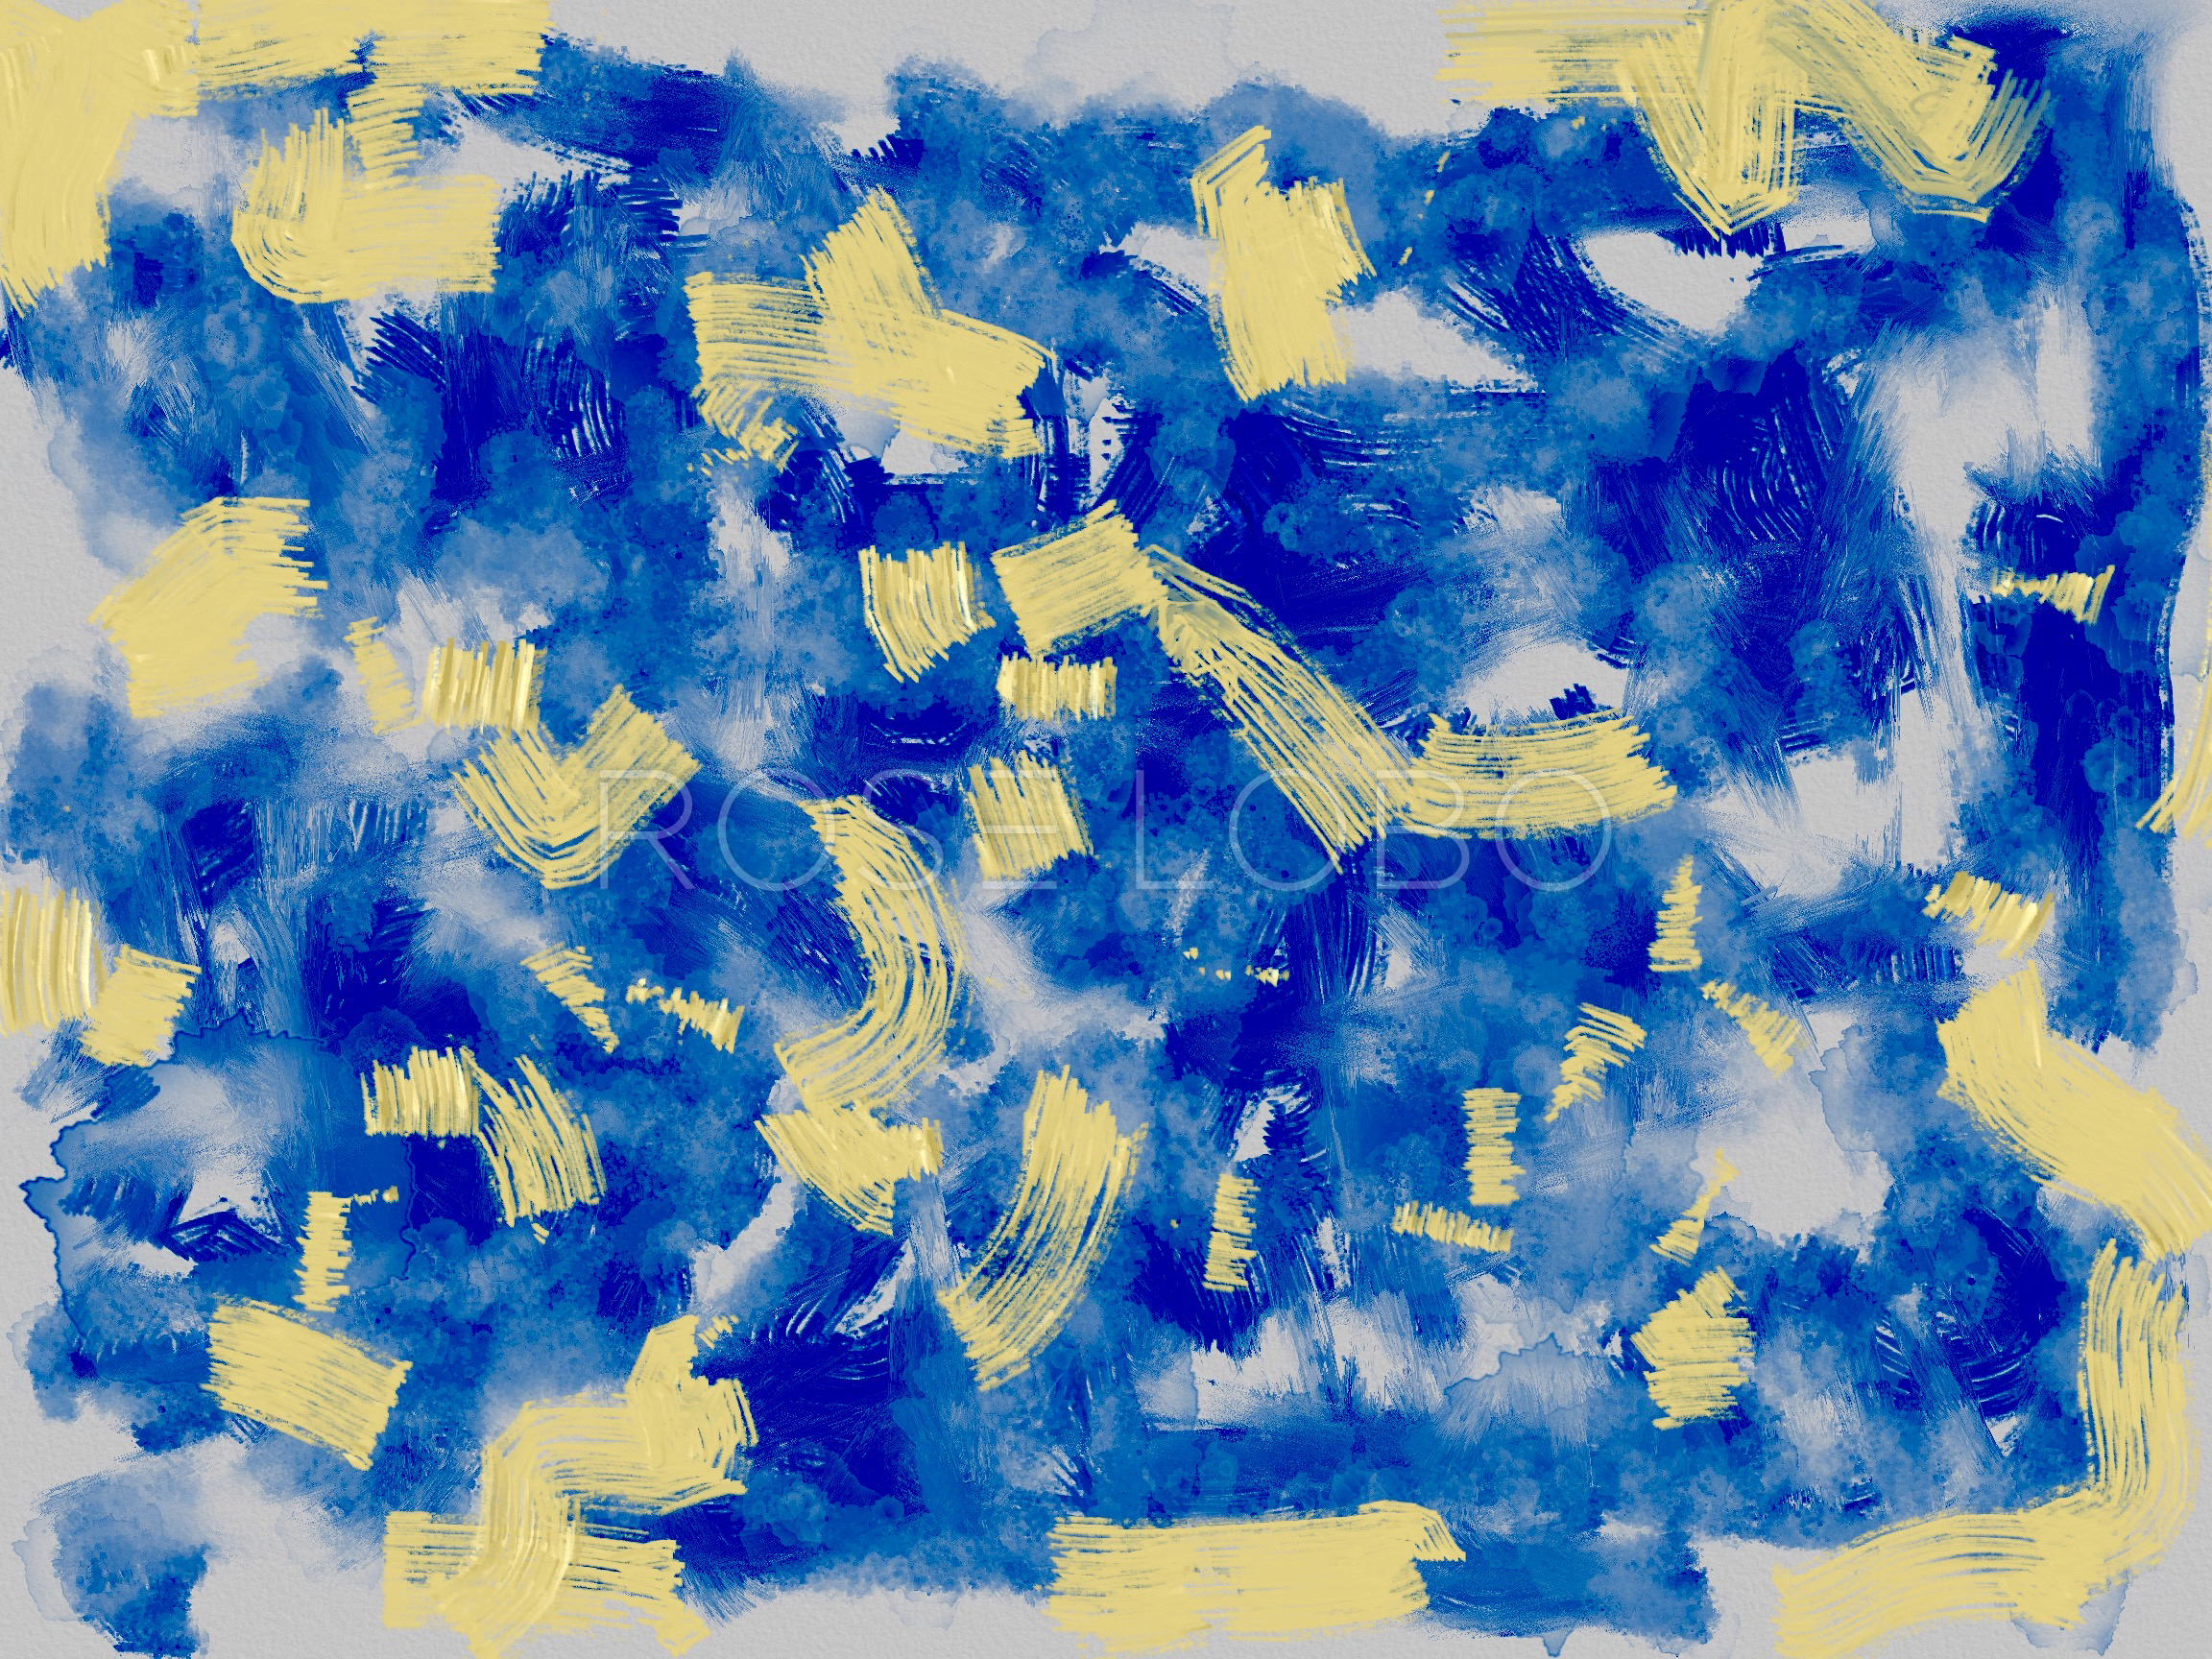 BLUE WATERS 1